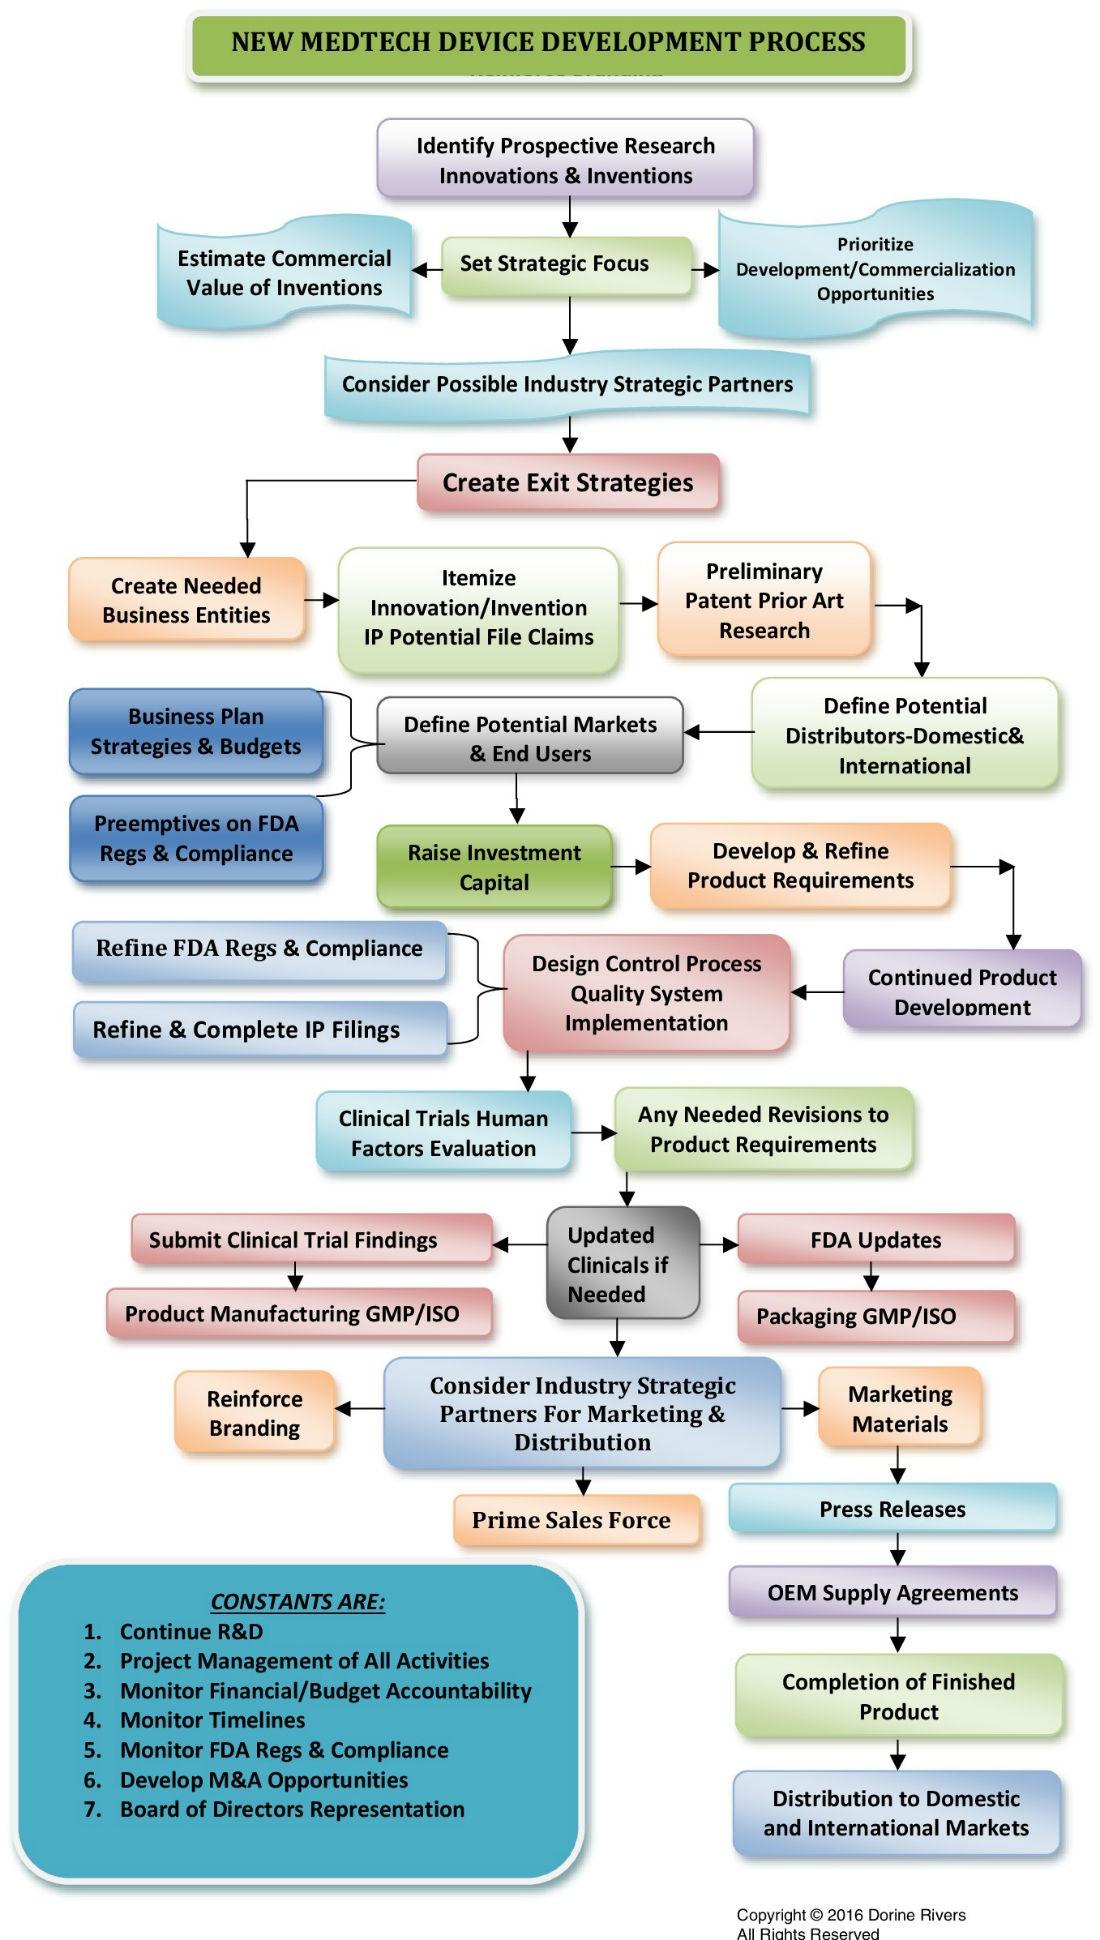 Navigating The 12 Steps Of Medtech Development - Medical Product